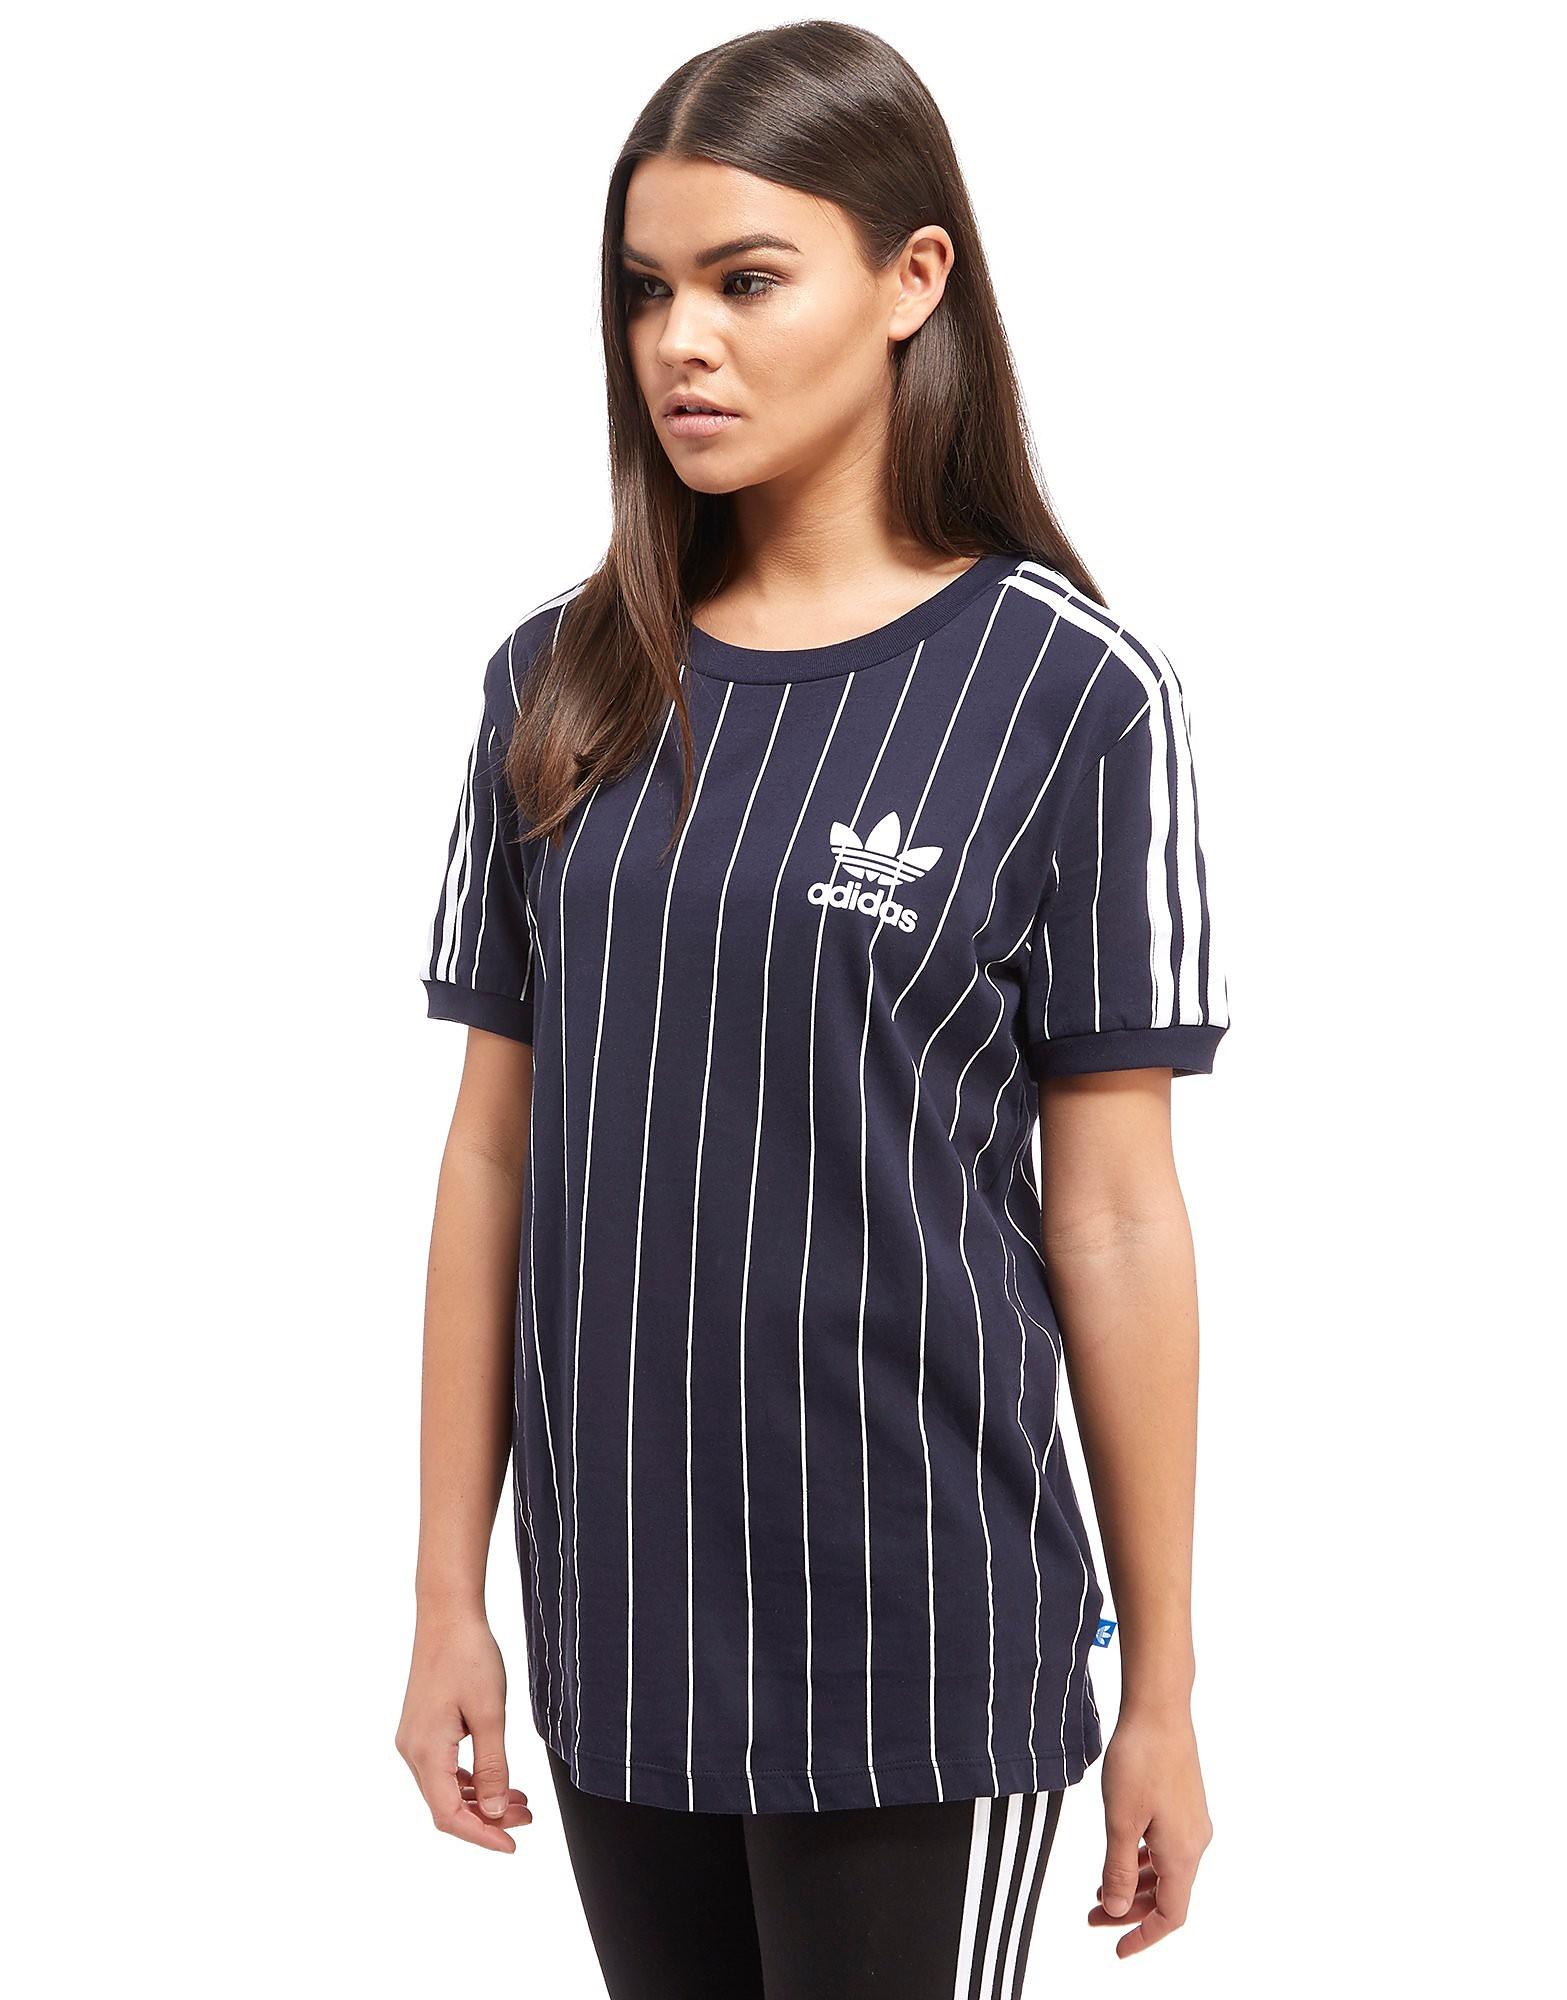 adidas Tennis Cali T-Shirt